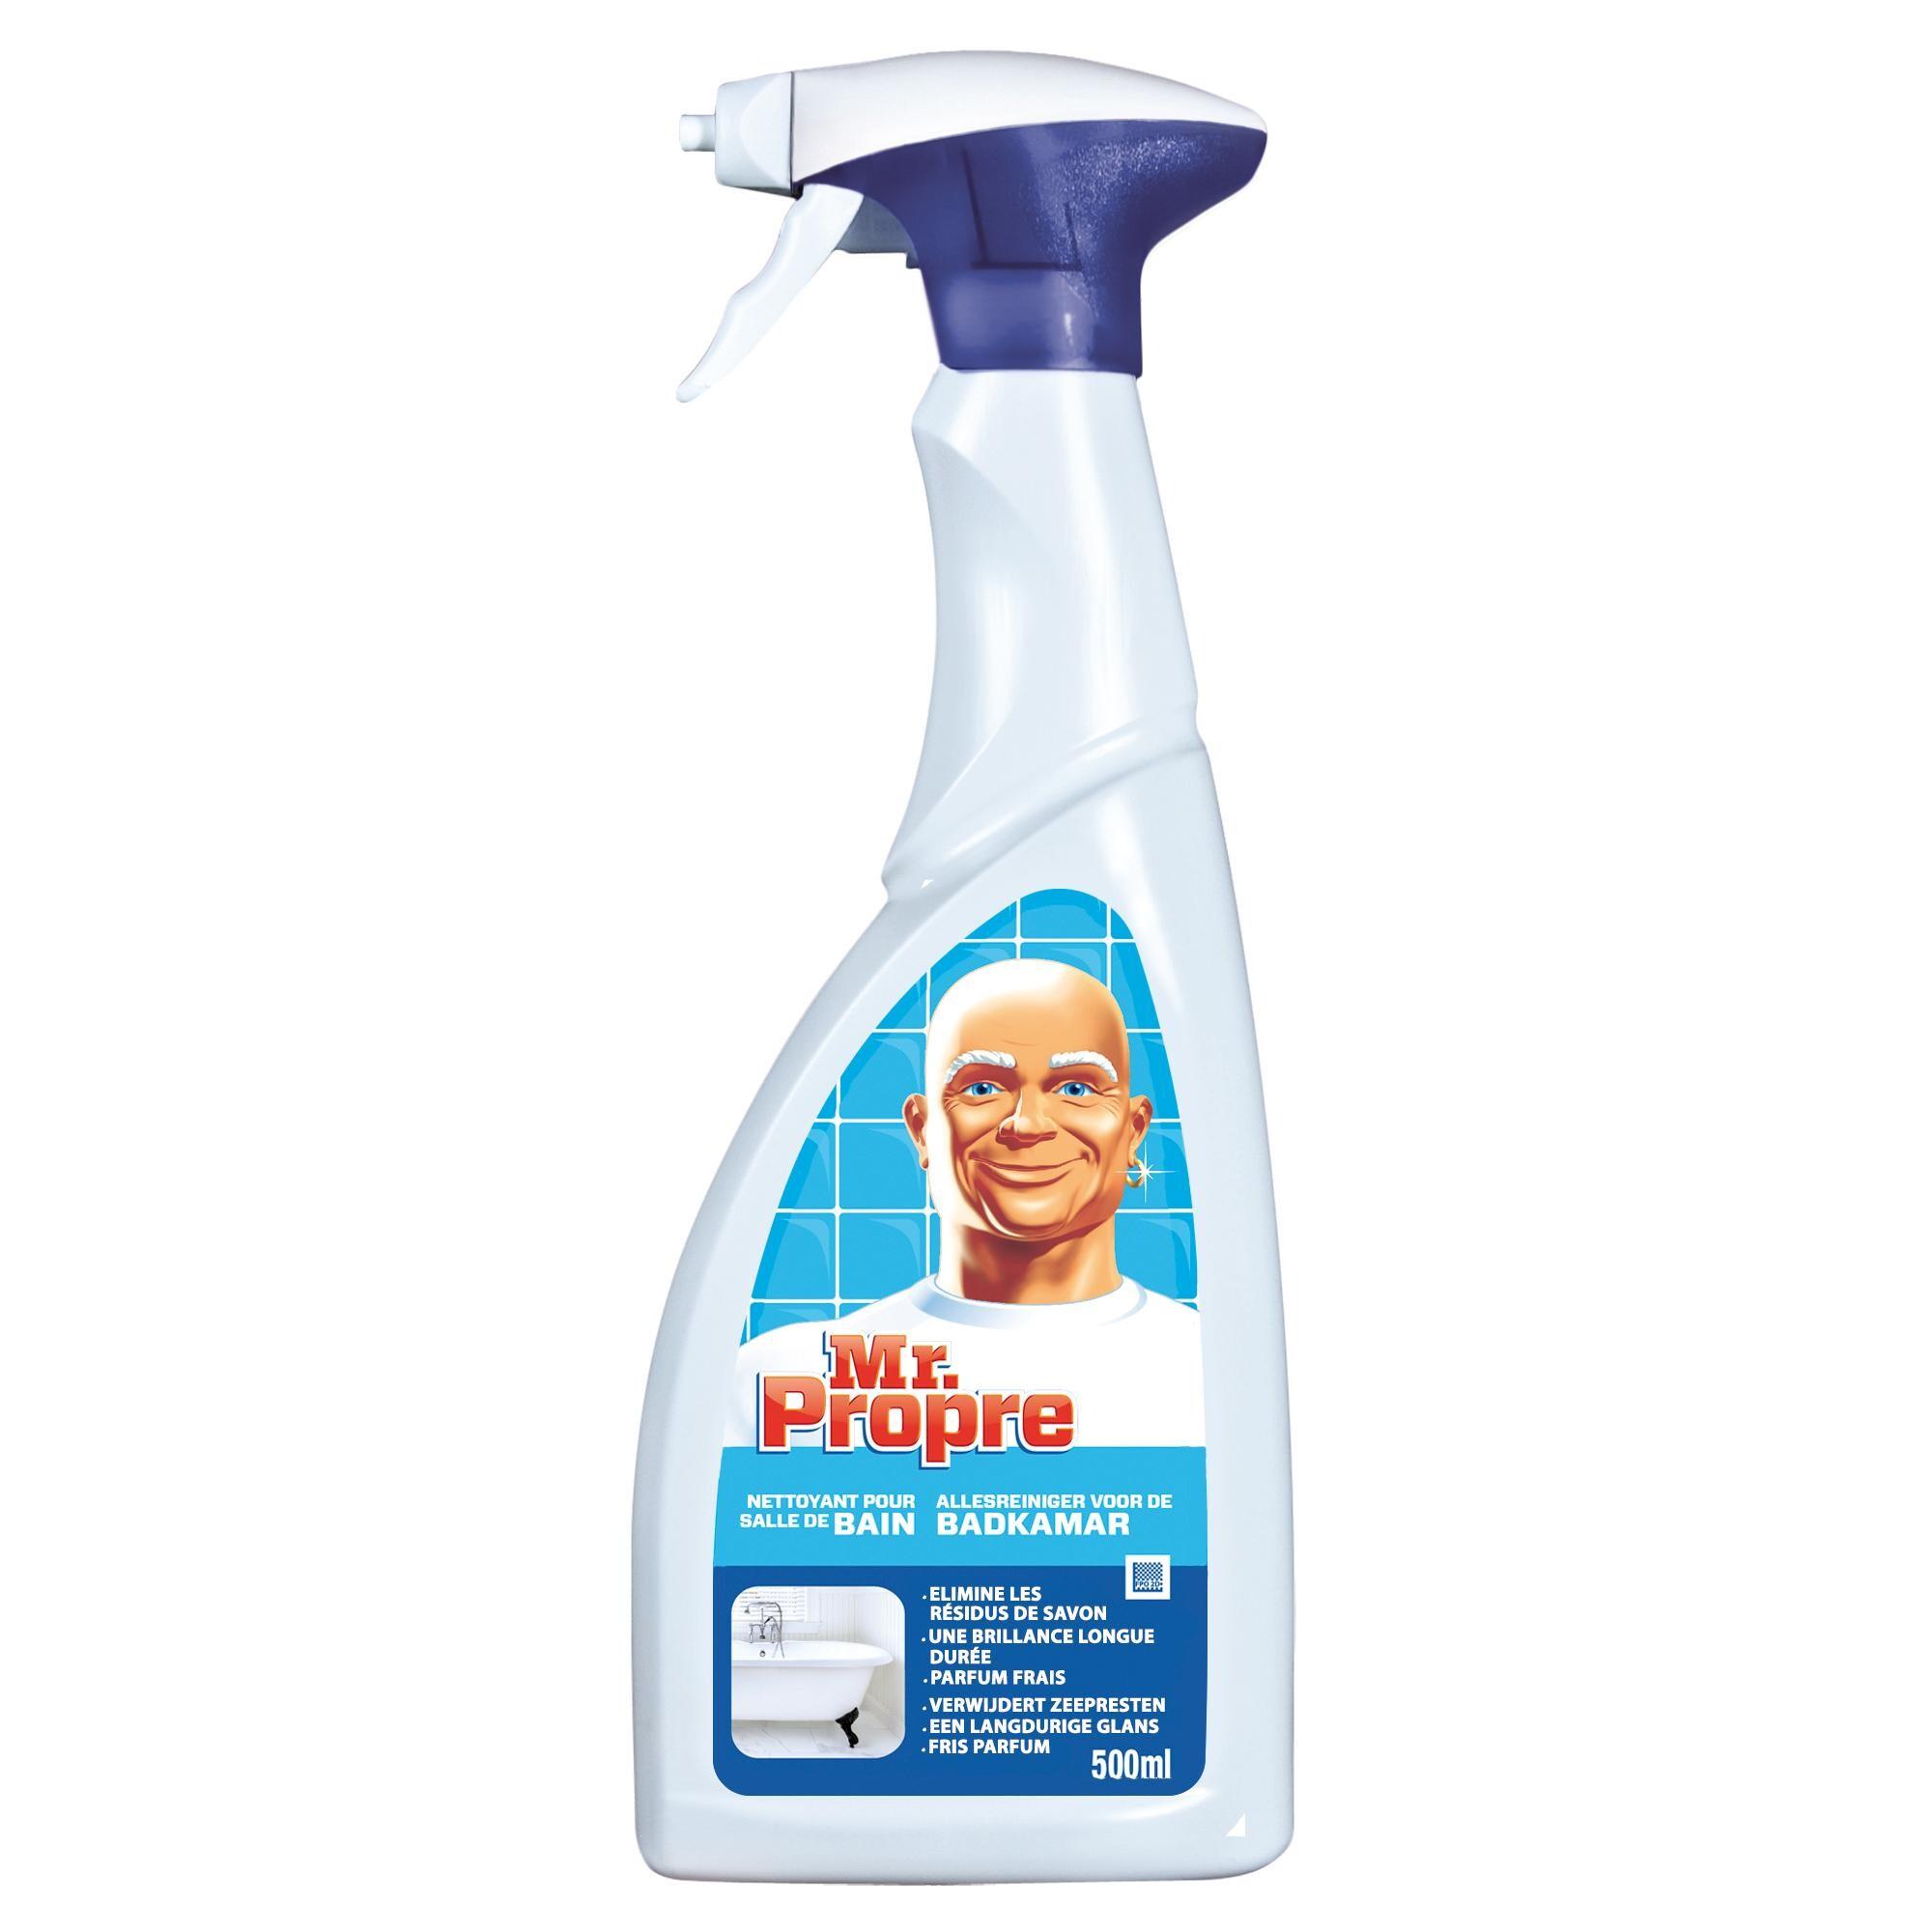 Mr.Proper Badkamer 500ml sanitair spray P&G Professional